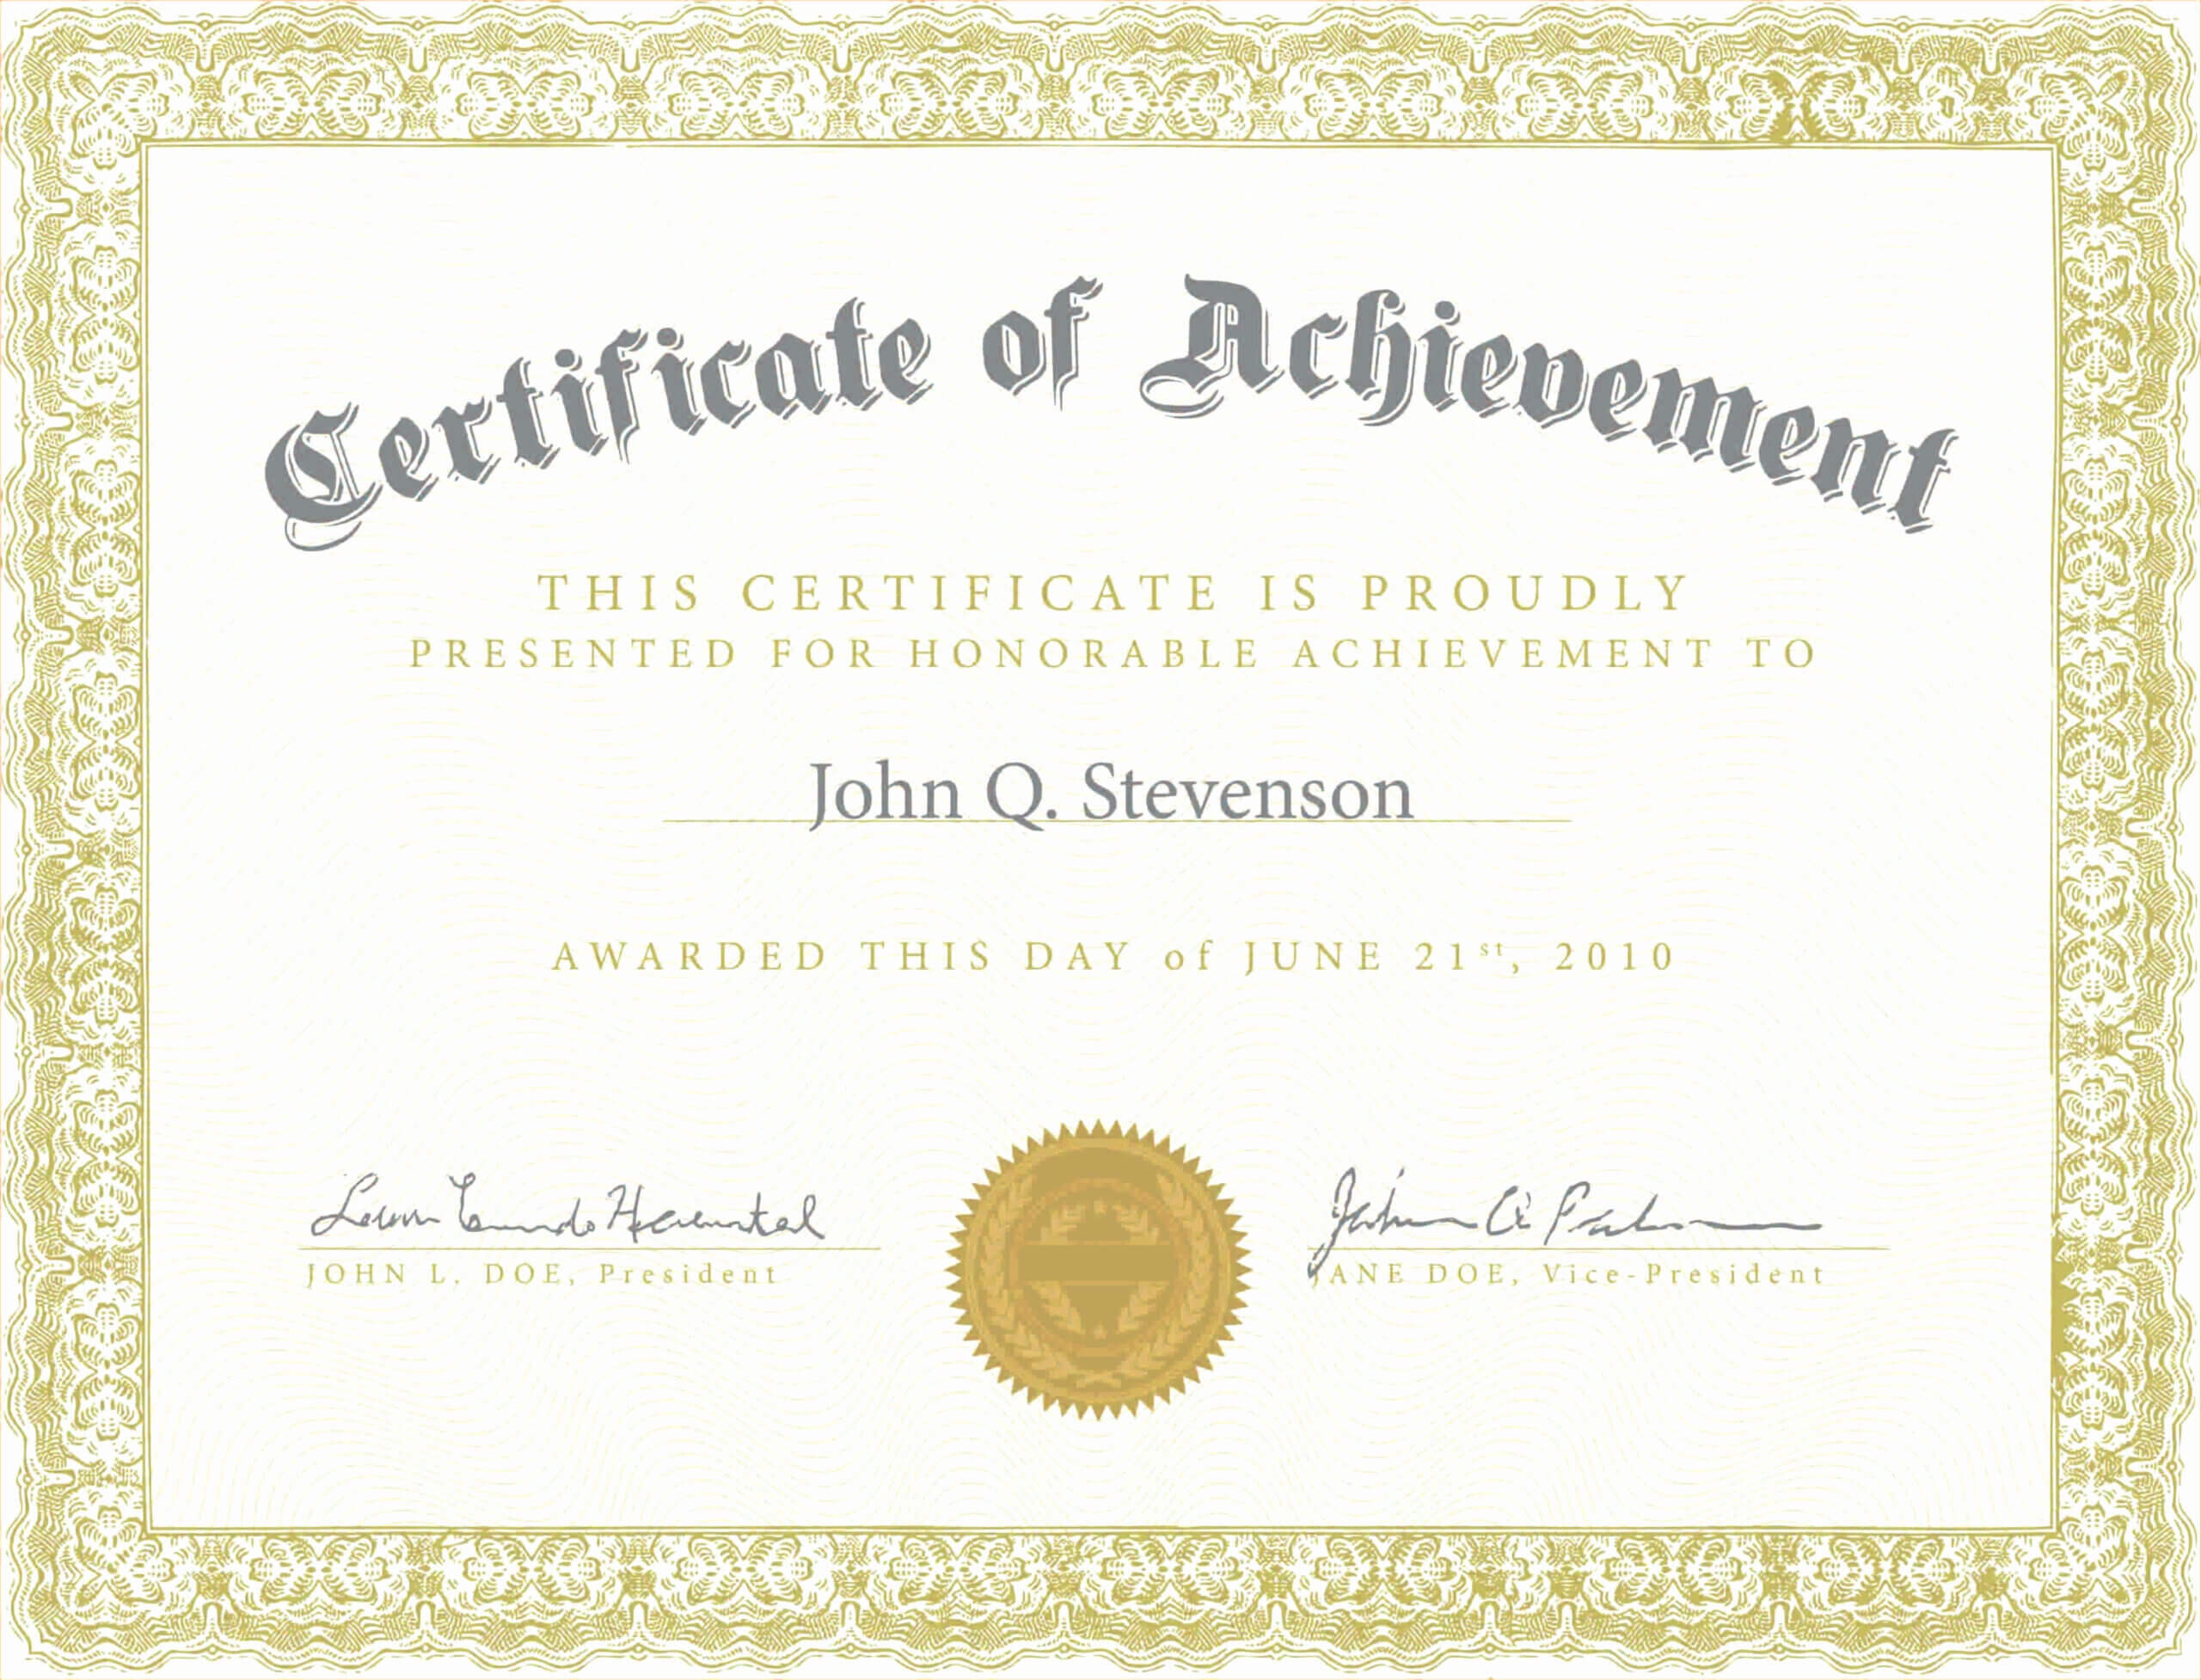 004 Army Certificate Of Appreciation Template Pdf Ideas For Army Certificate Of Appreciation Template